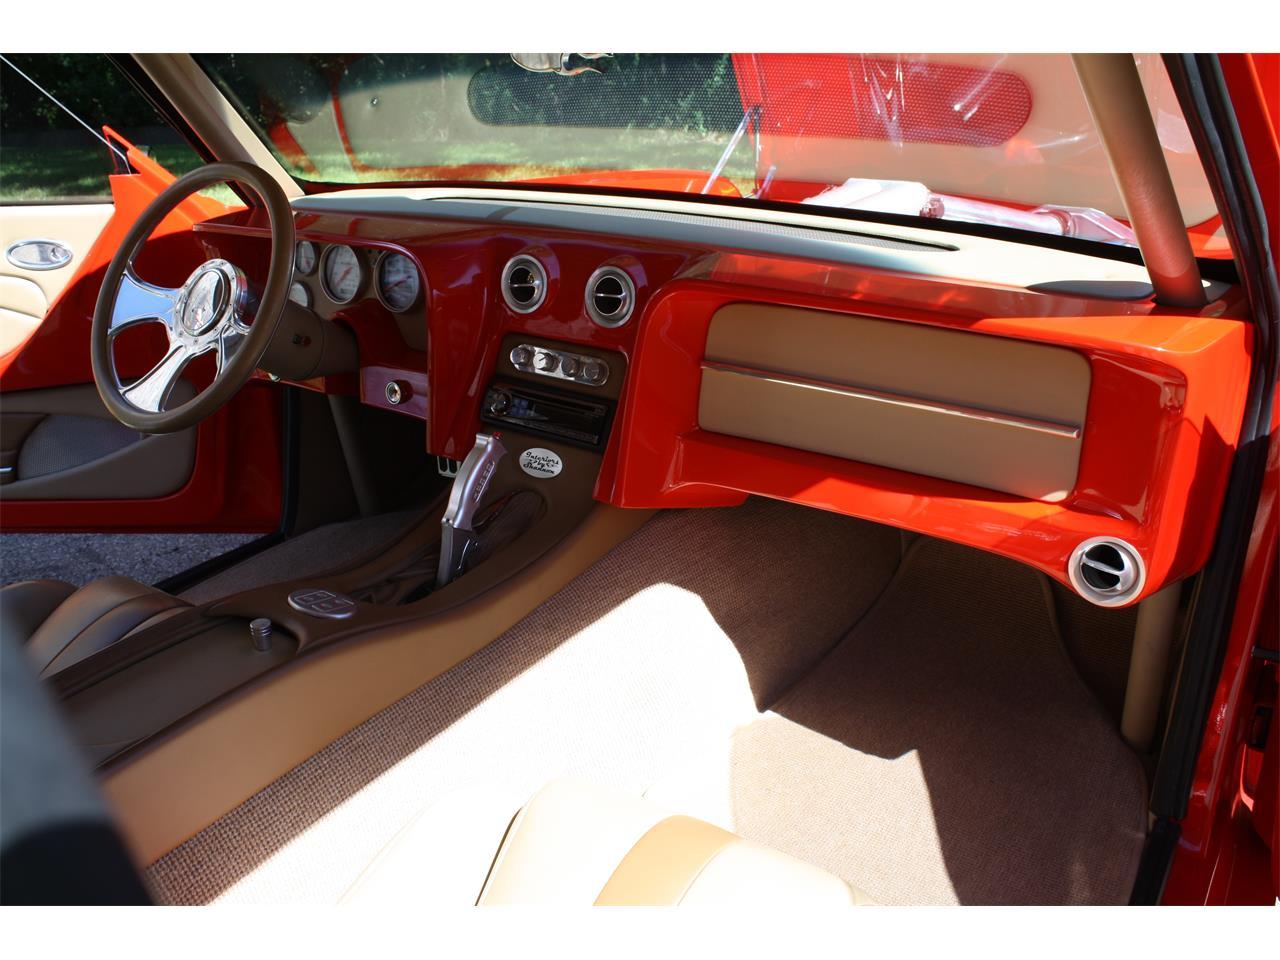 1967 Chevrolet Nova (CC-1197145) for sale in Hot Springs, Arkansas